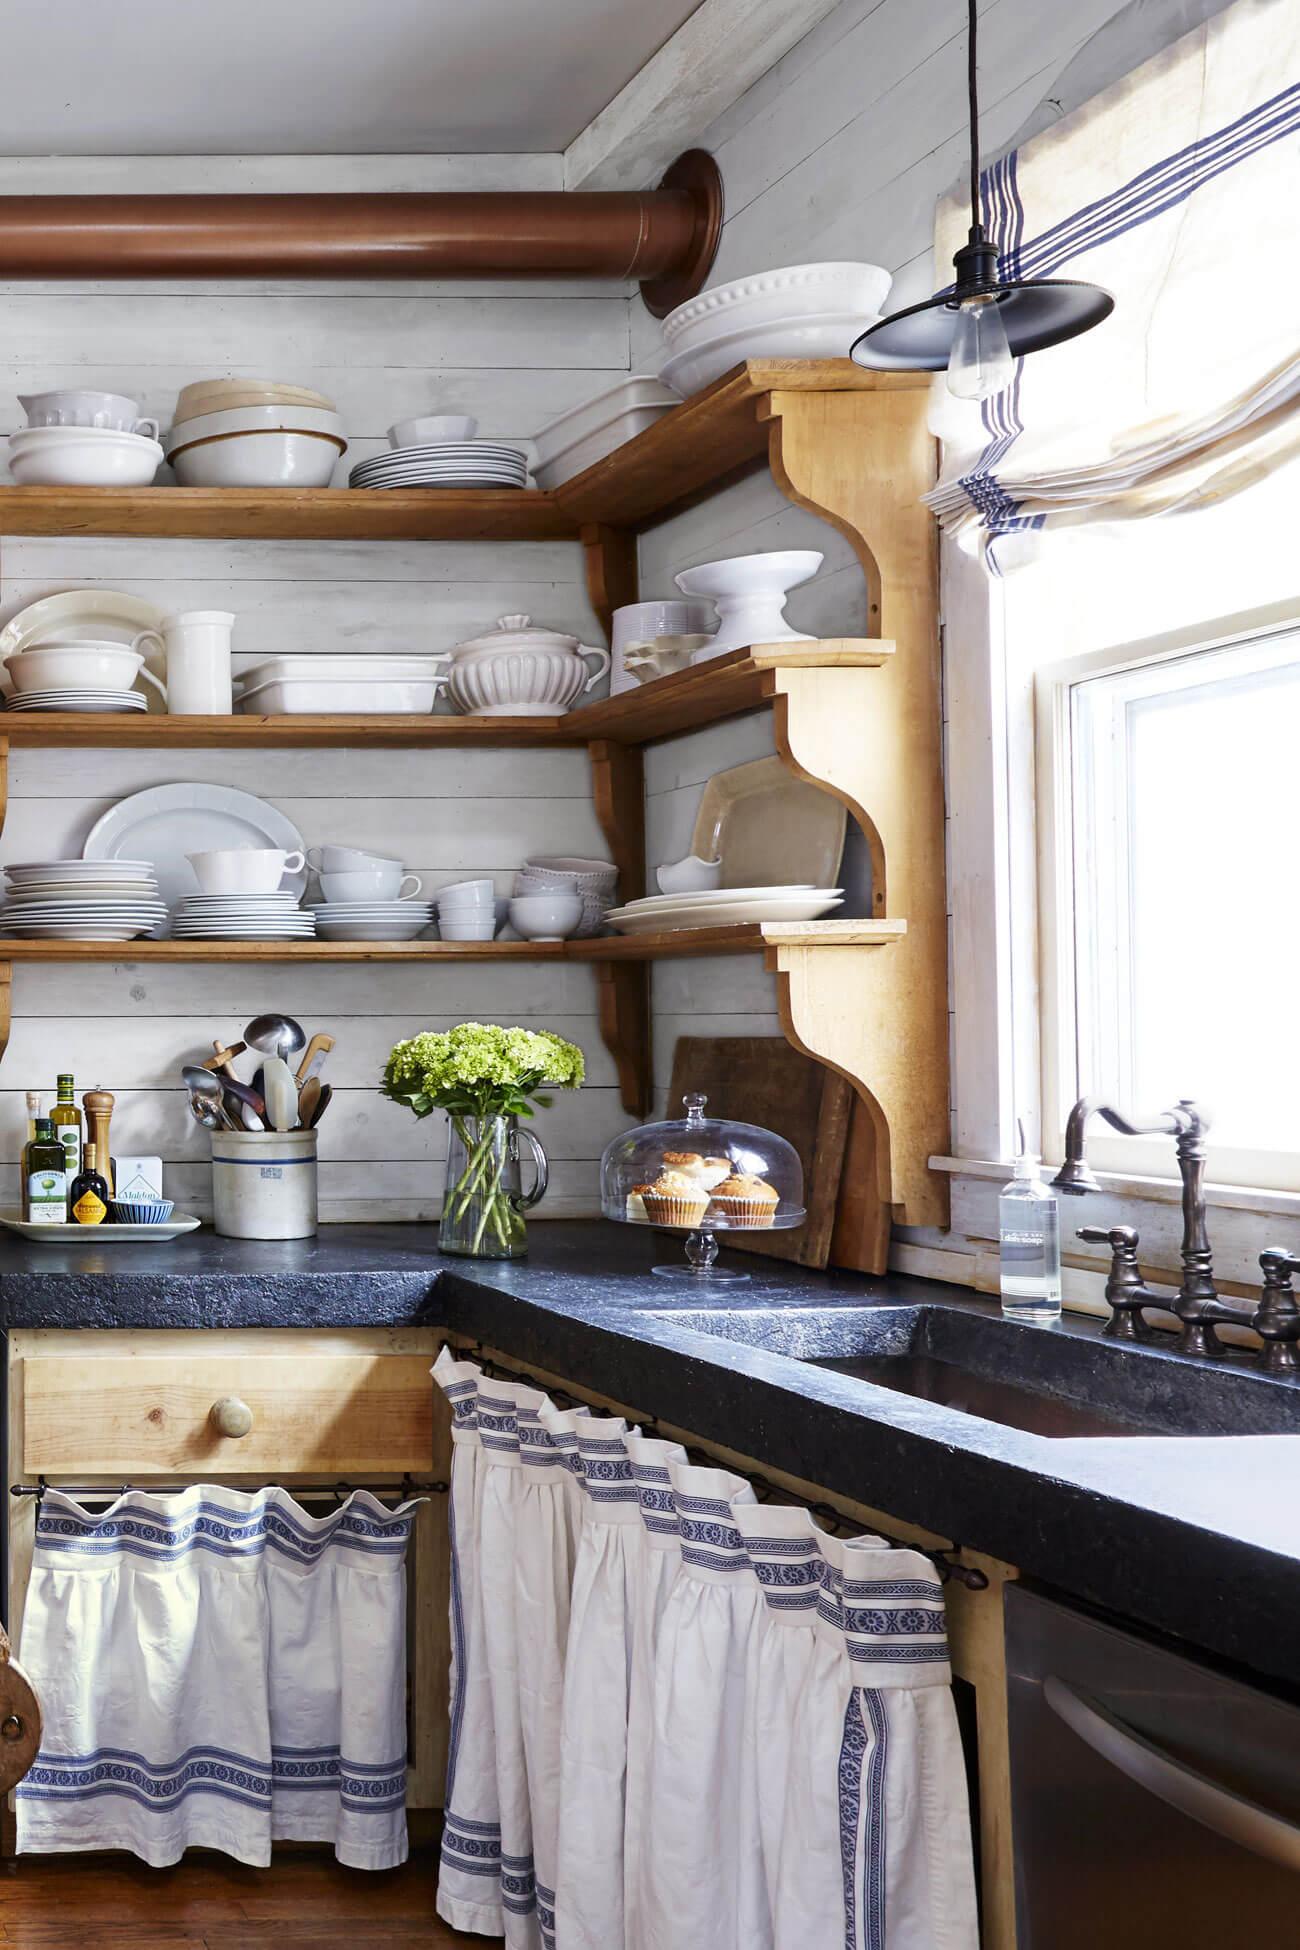 38 Best Farmhouse Kitchen Decor and Design Ideas for 2017 on Farmhouse Kitchen Counter Decor Ideas  id=27453